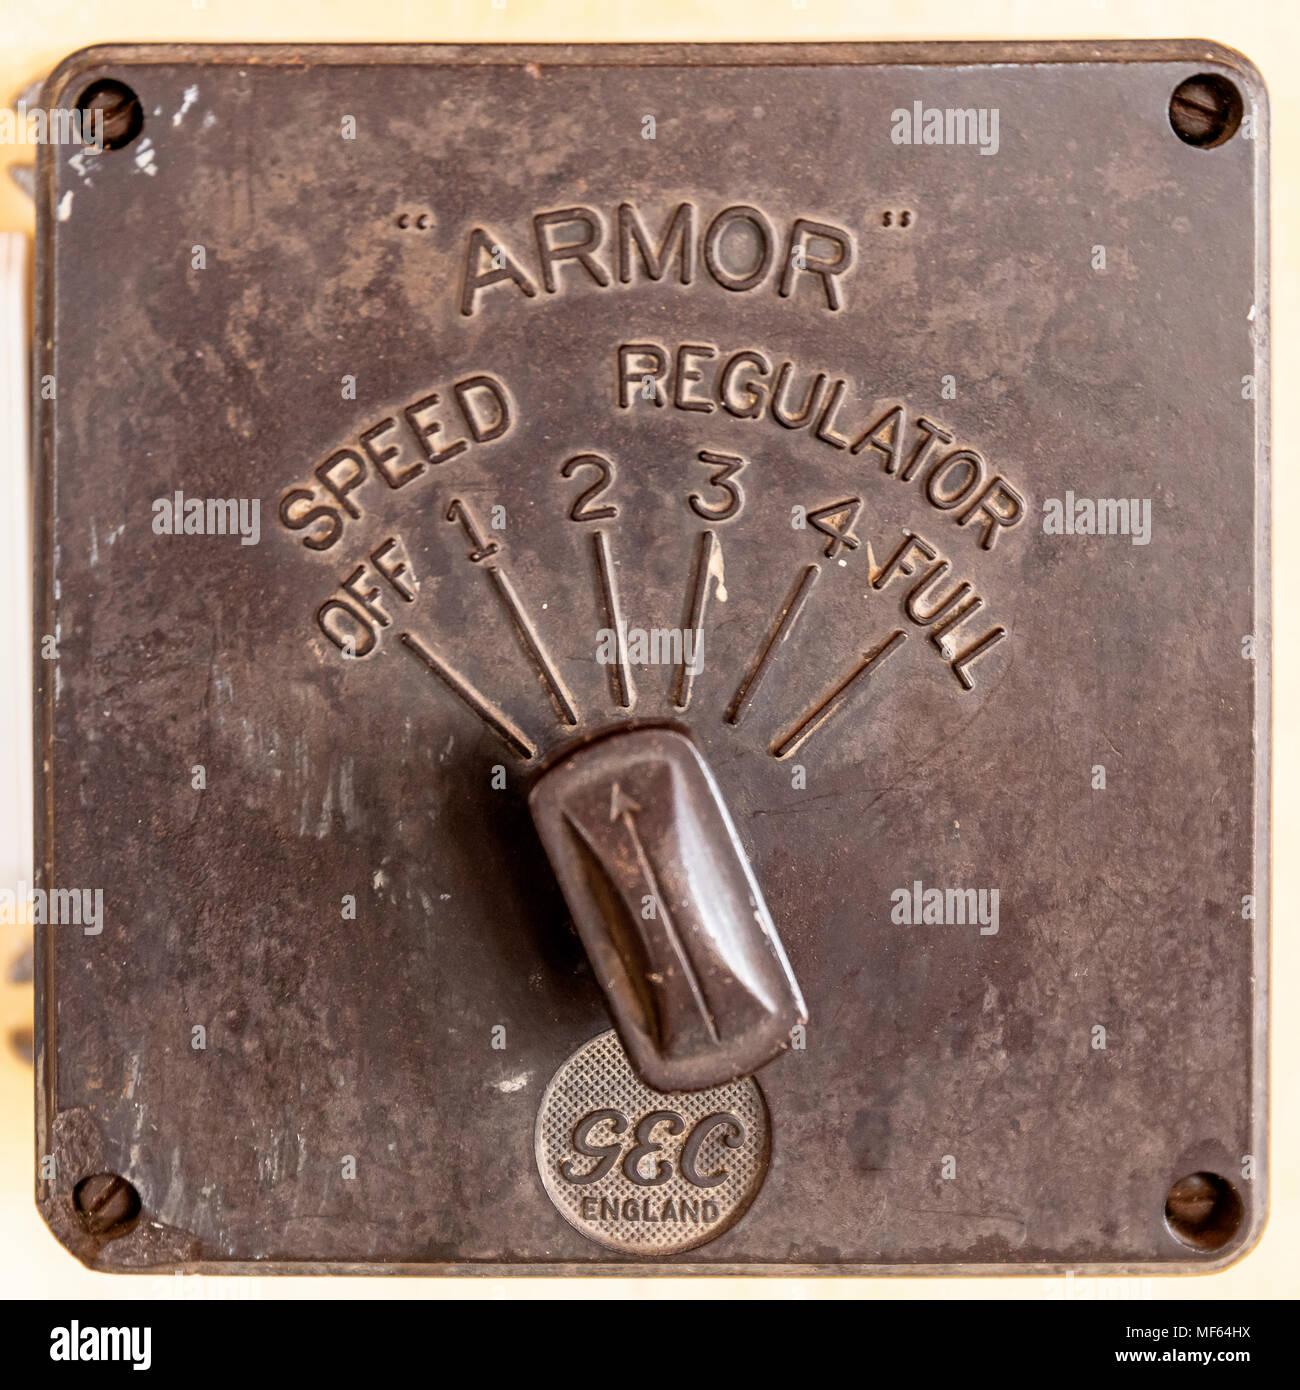 Armor Speed Regulator - Stock Image